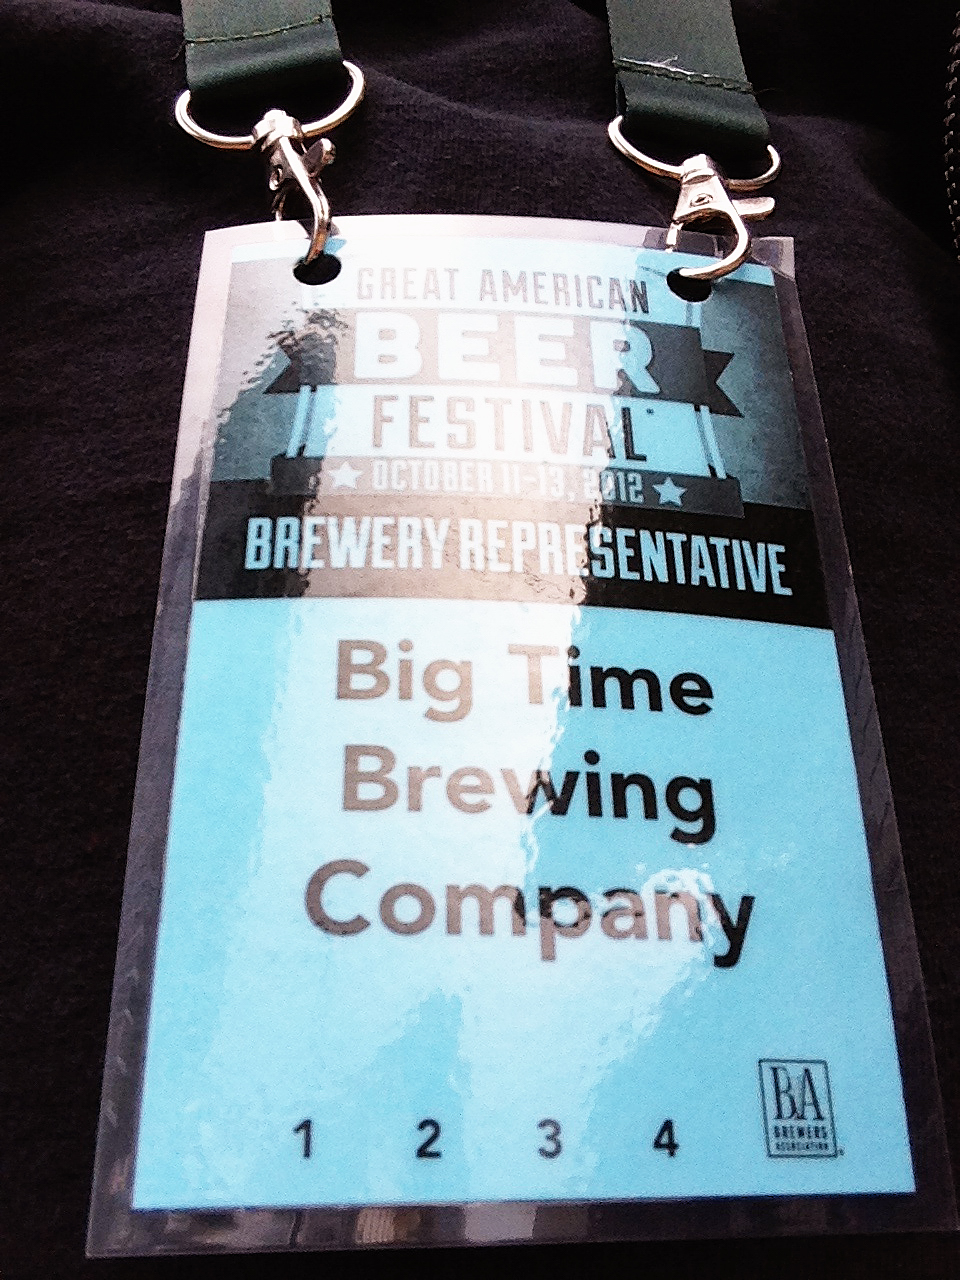 Representing Big Time Brewery